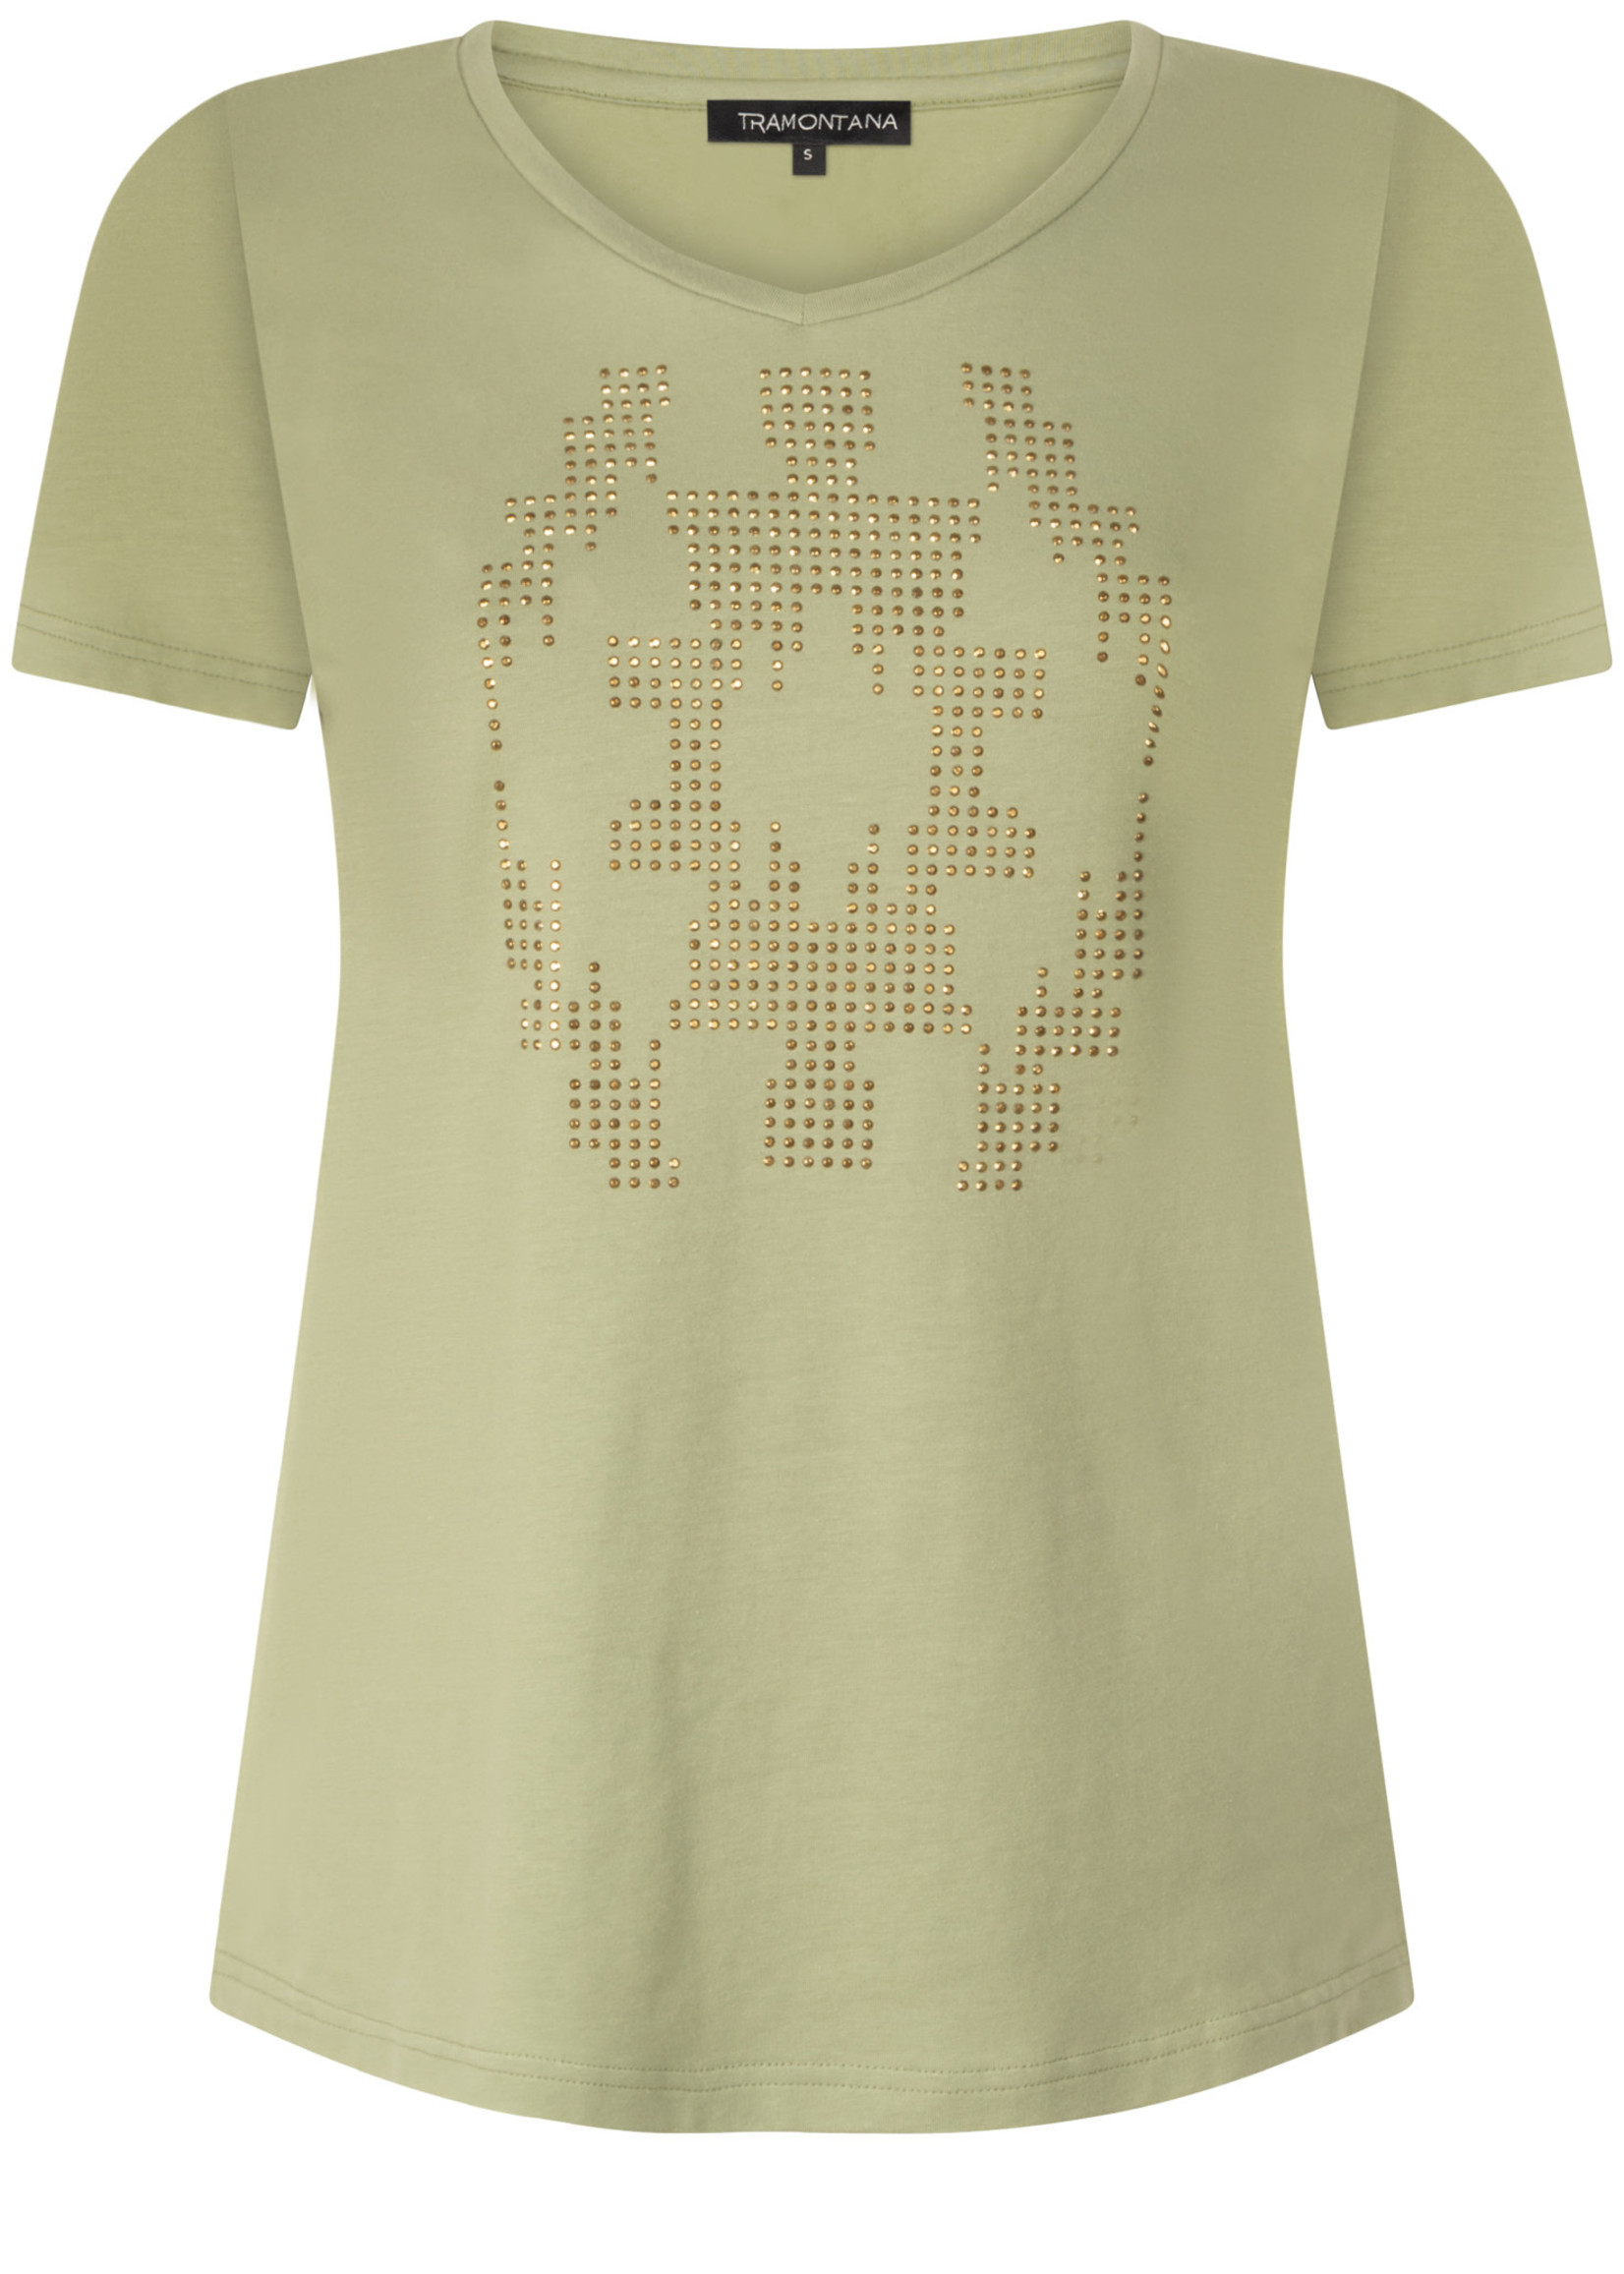 Tramontana T-Shirt Studs Figure